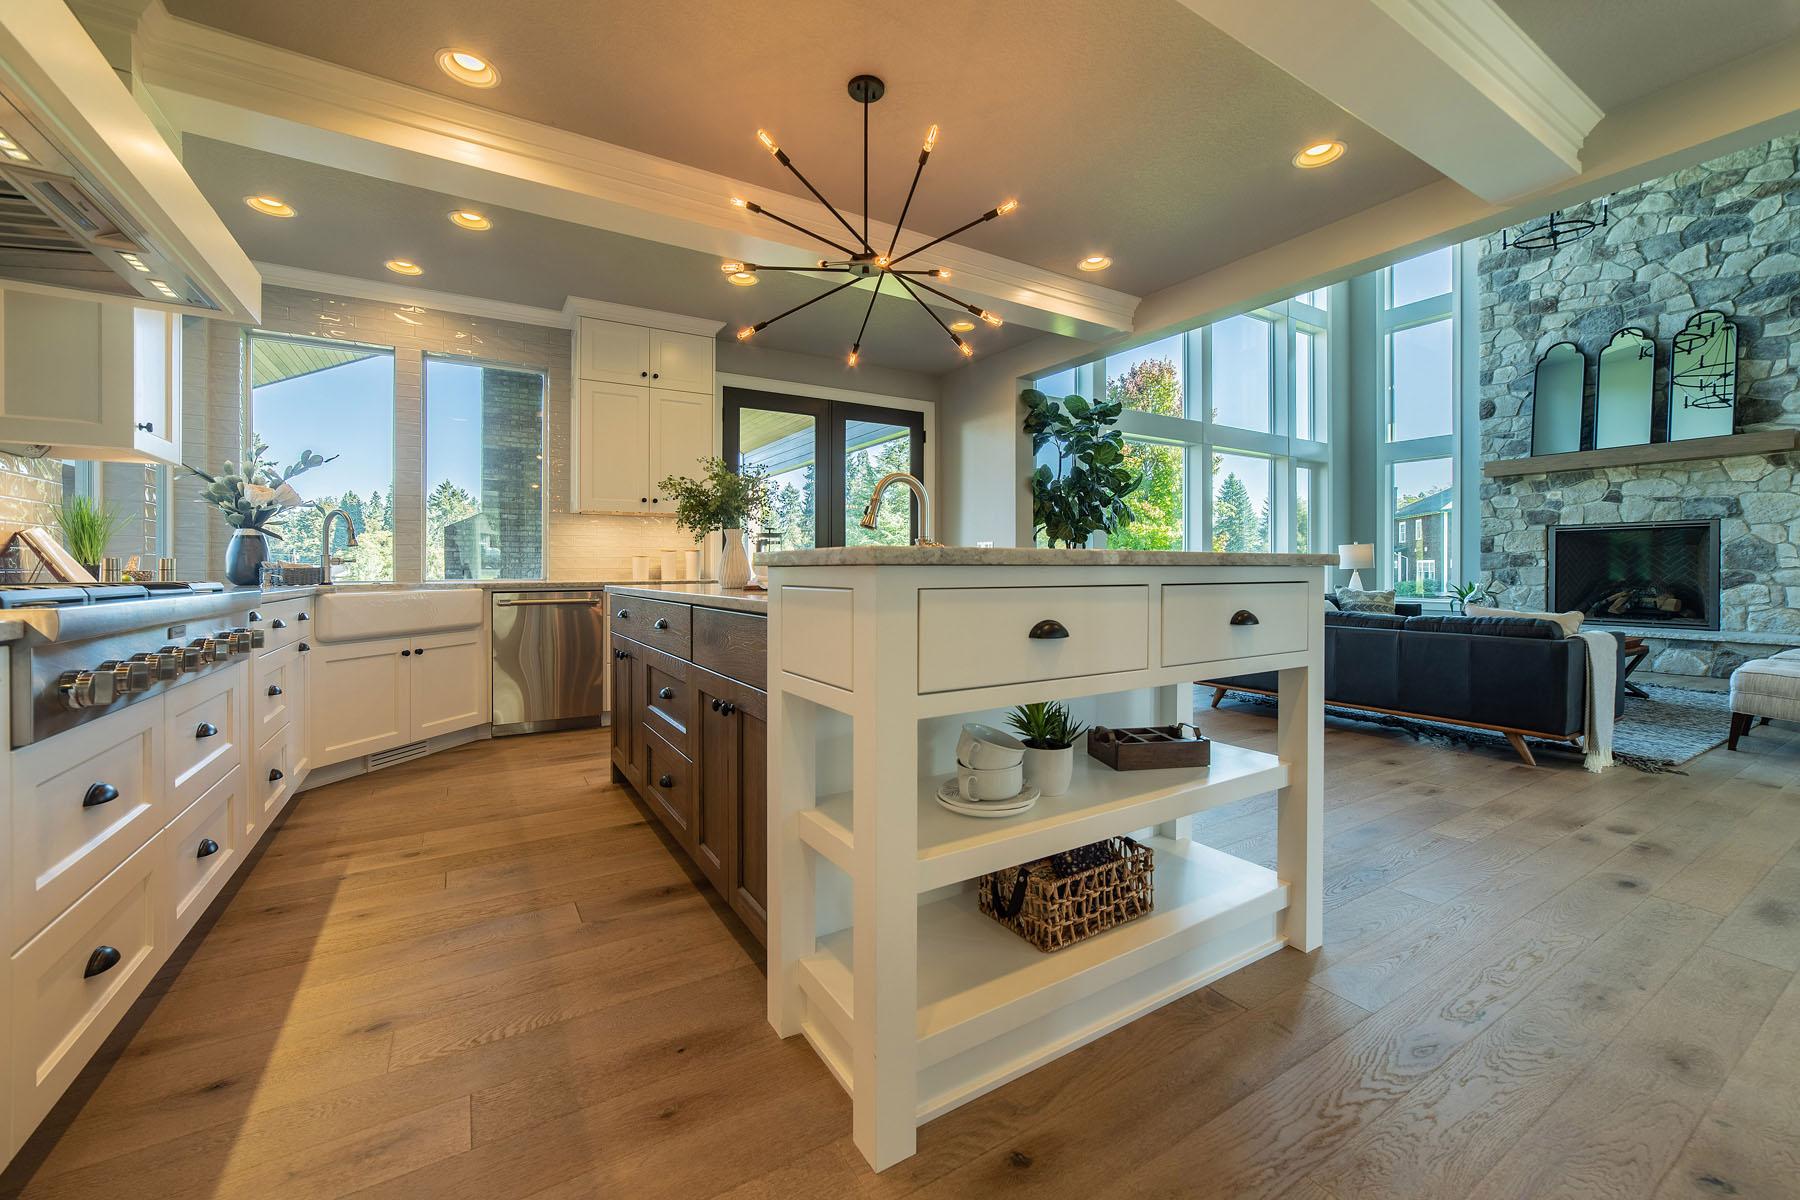 Bosky Dell kitchen